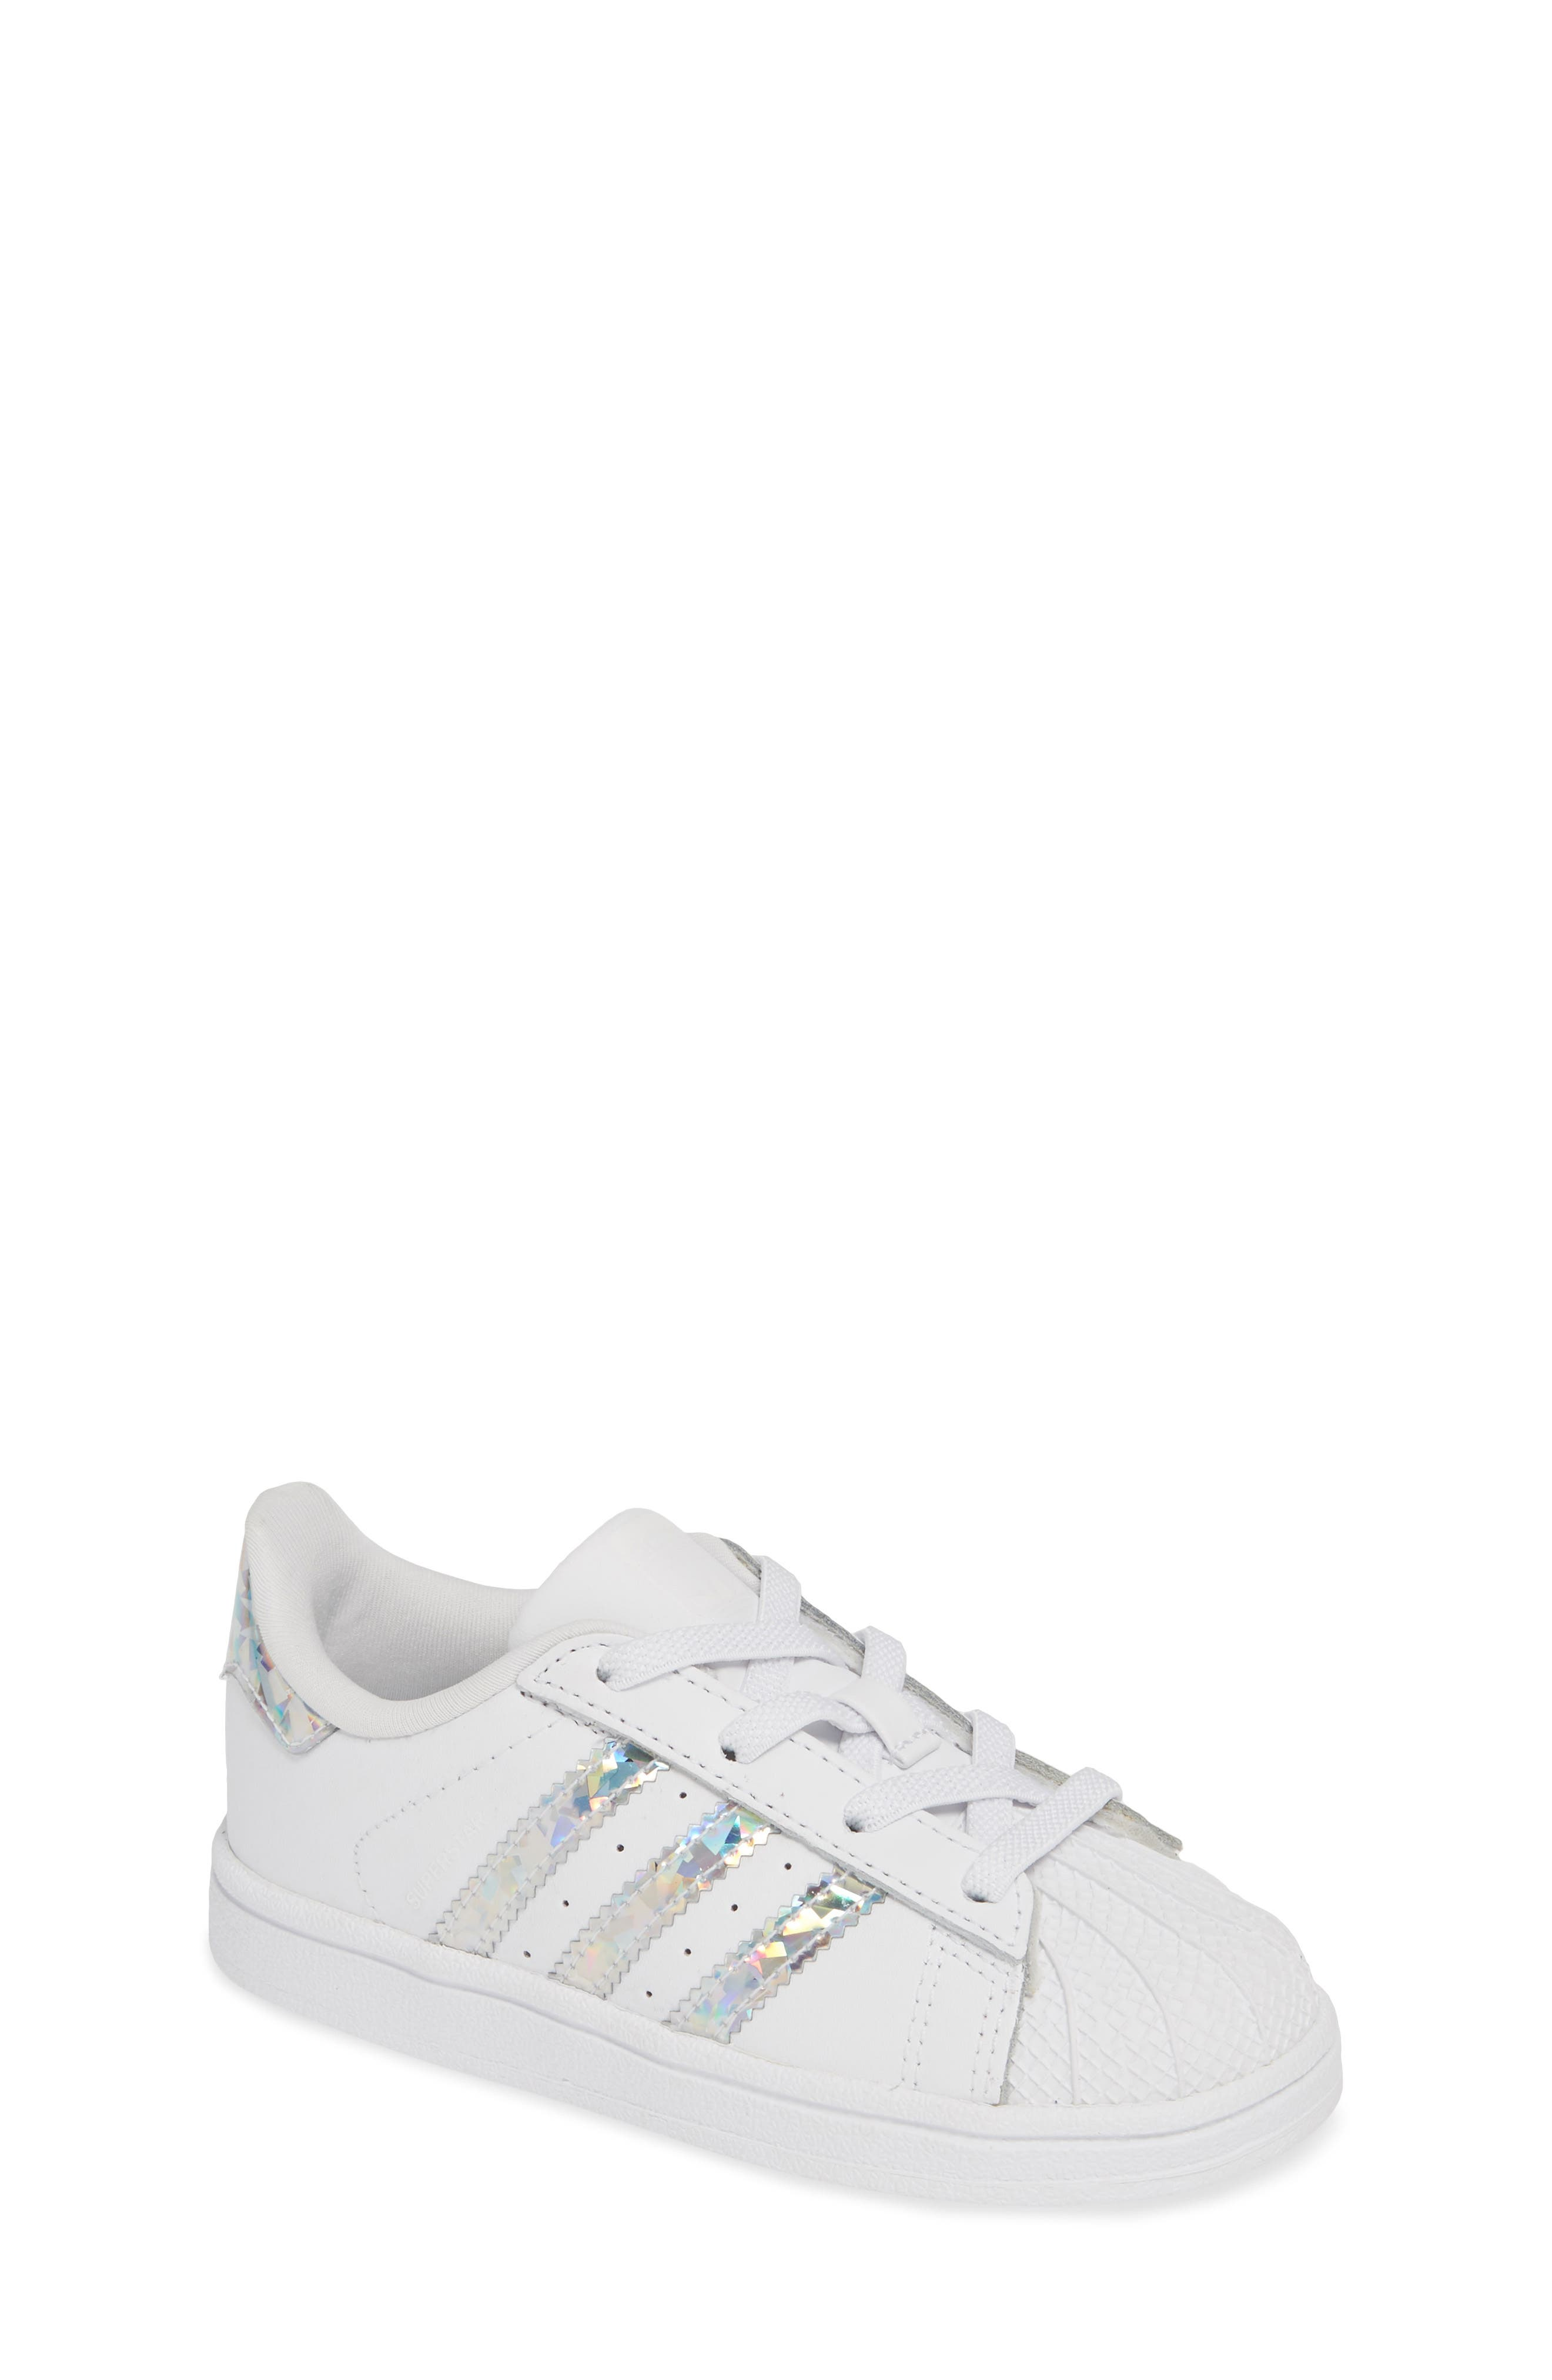 official photos dffd2 6e8bf adidas Womens Shoes